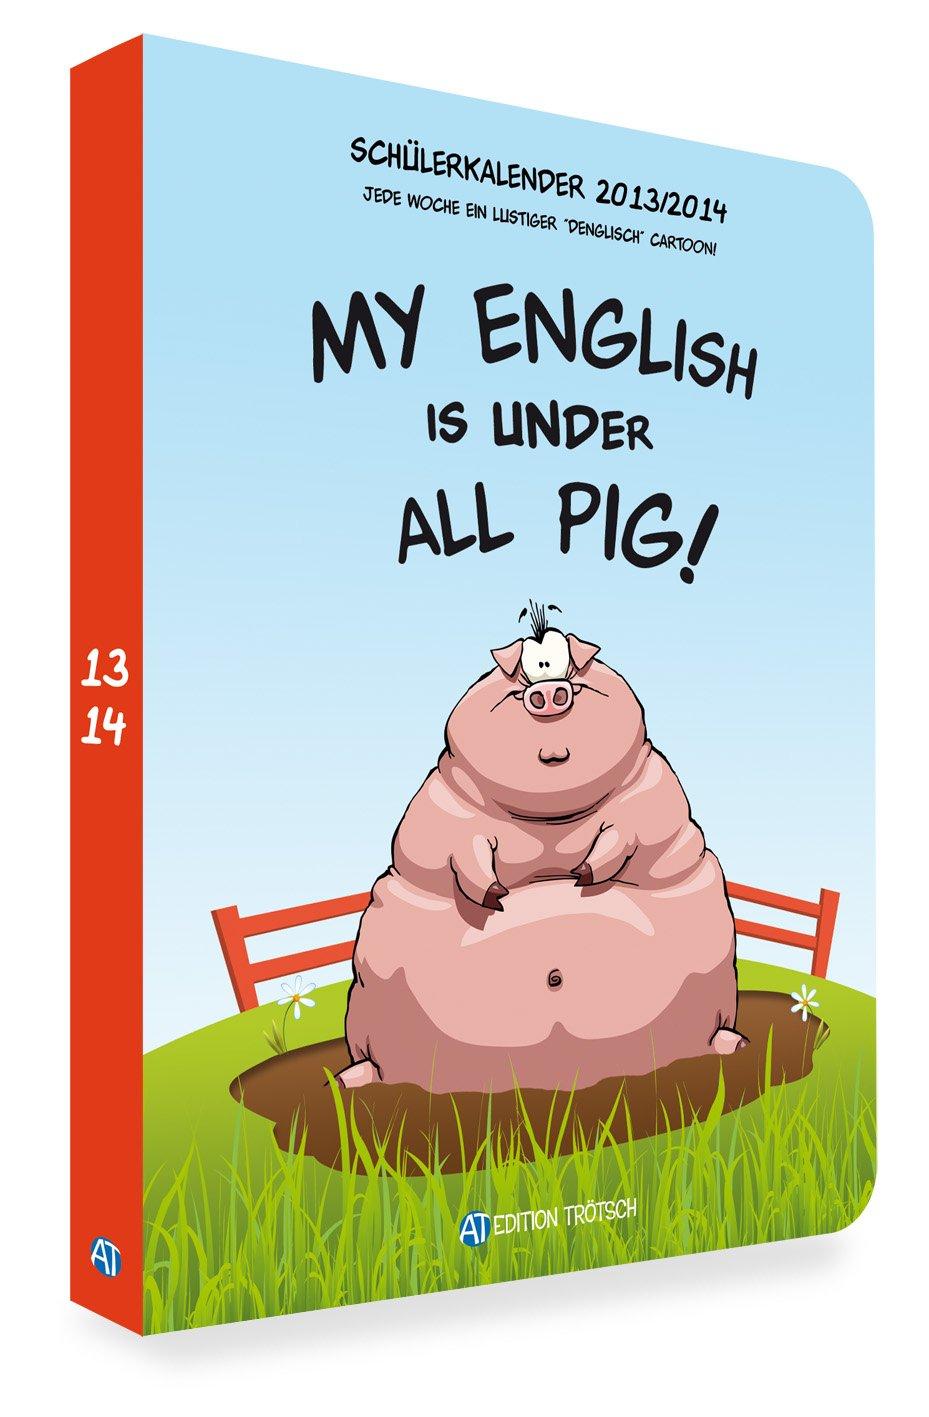 Schülerkalender Specials - My English 13/14